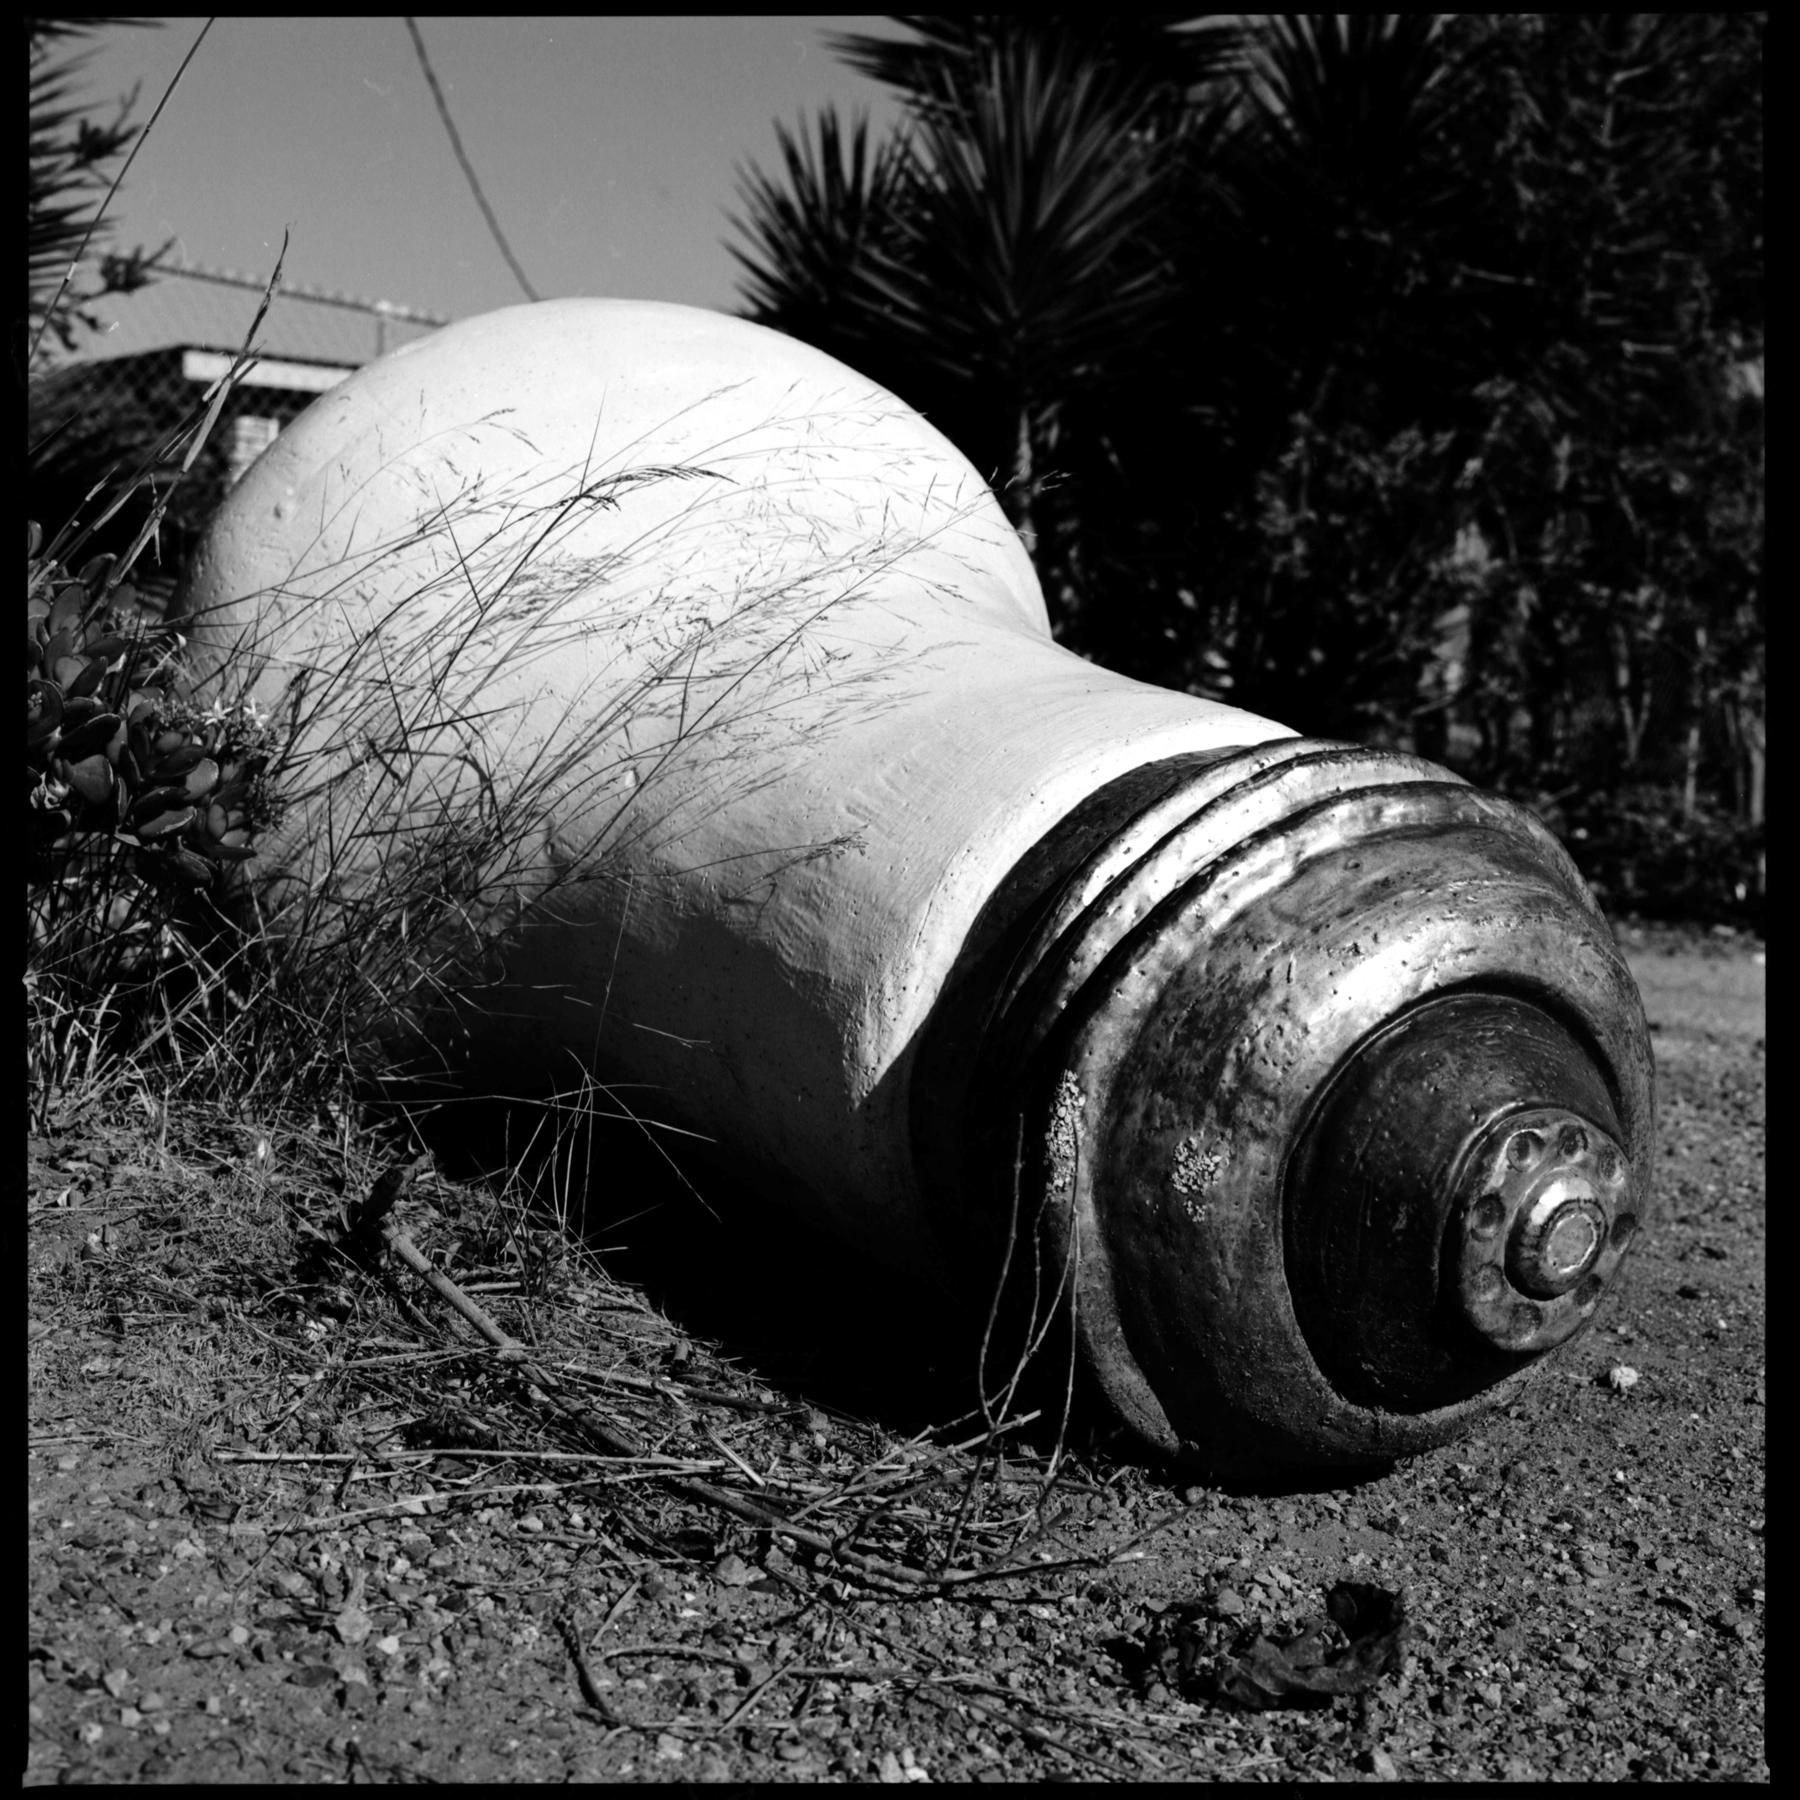 Big Idea Abandoned | Hasselblad 500cm | 80mm | ACROS 100 | Russ Morris